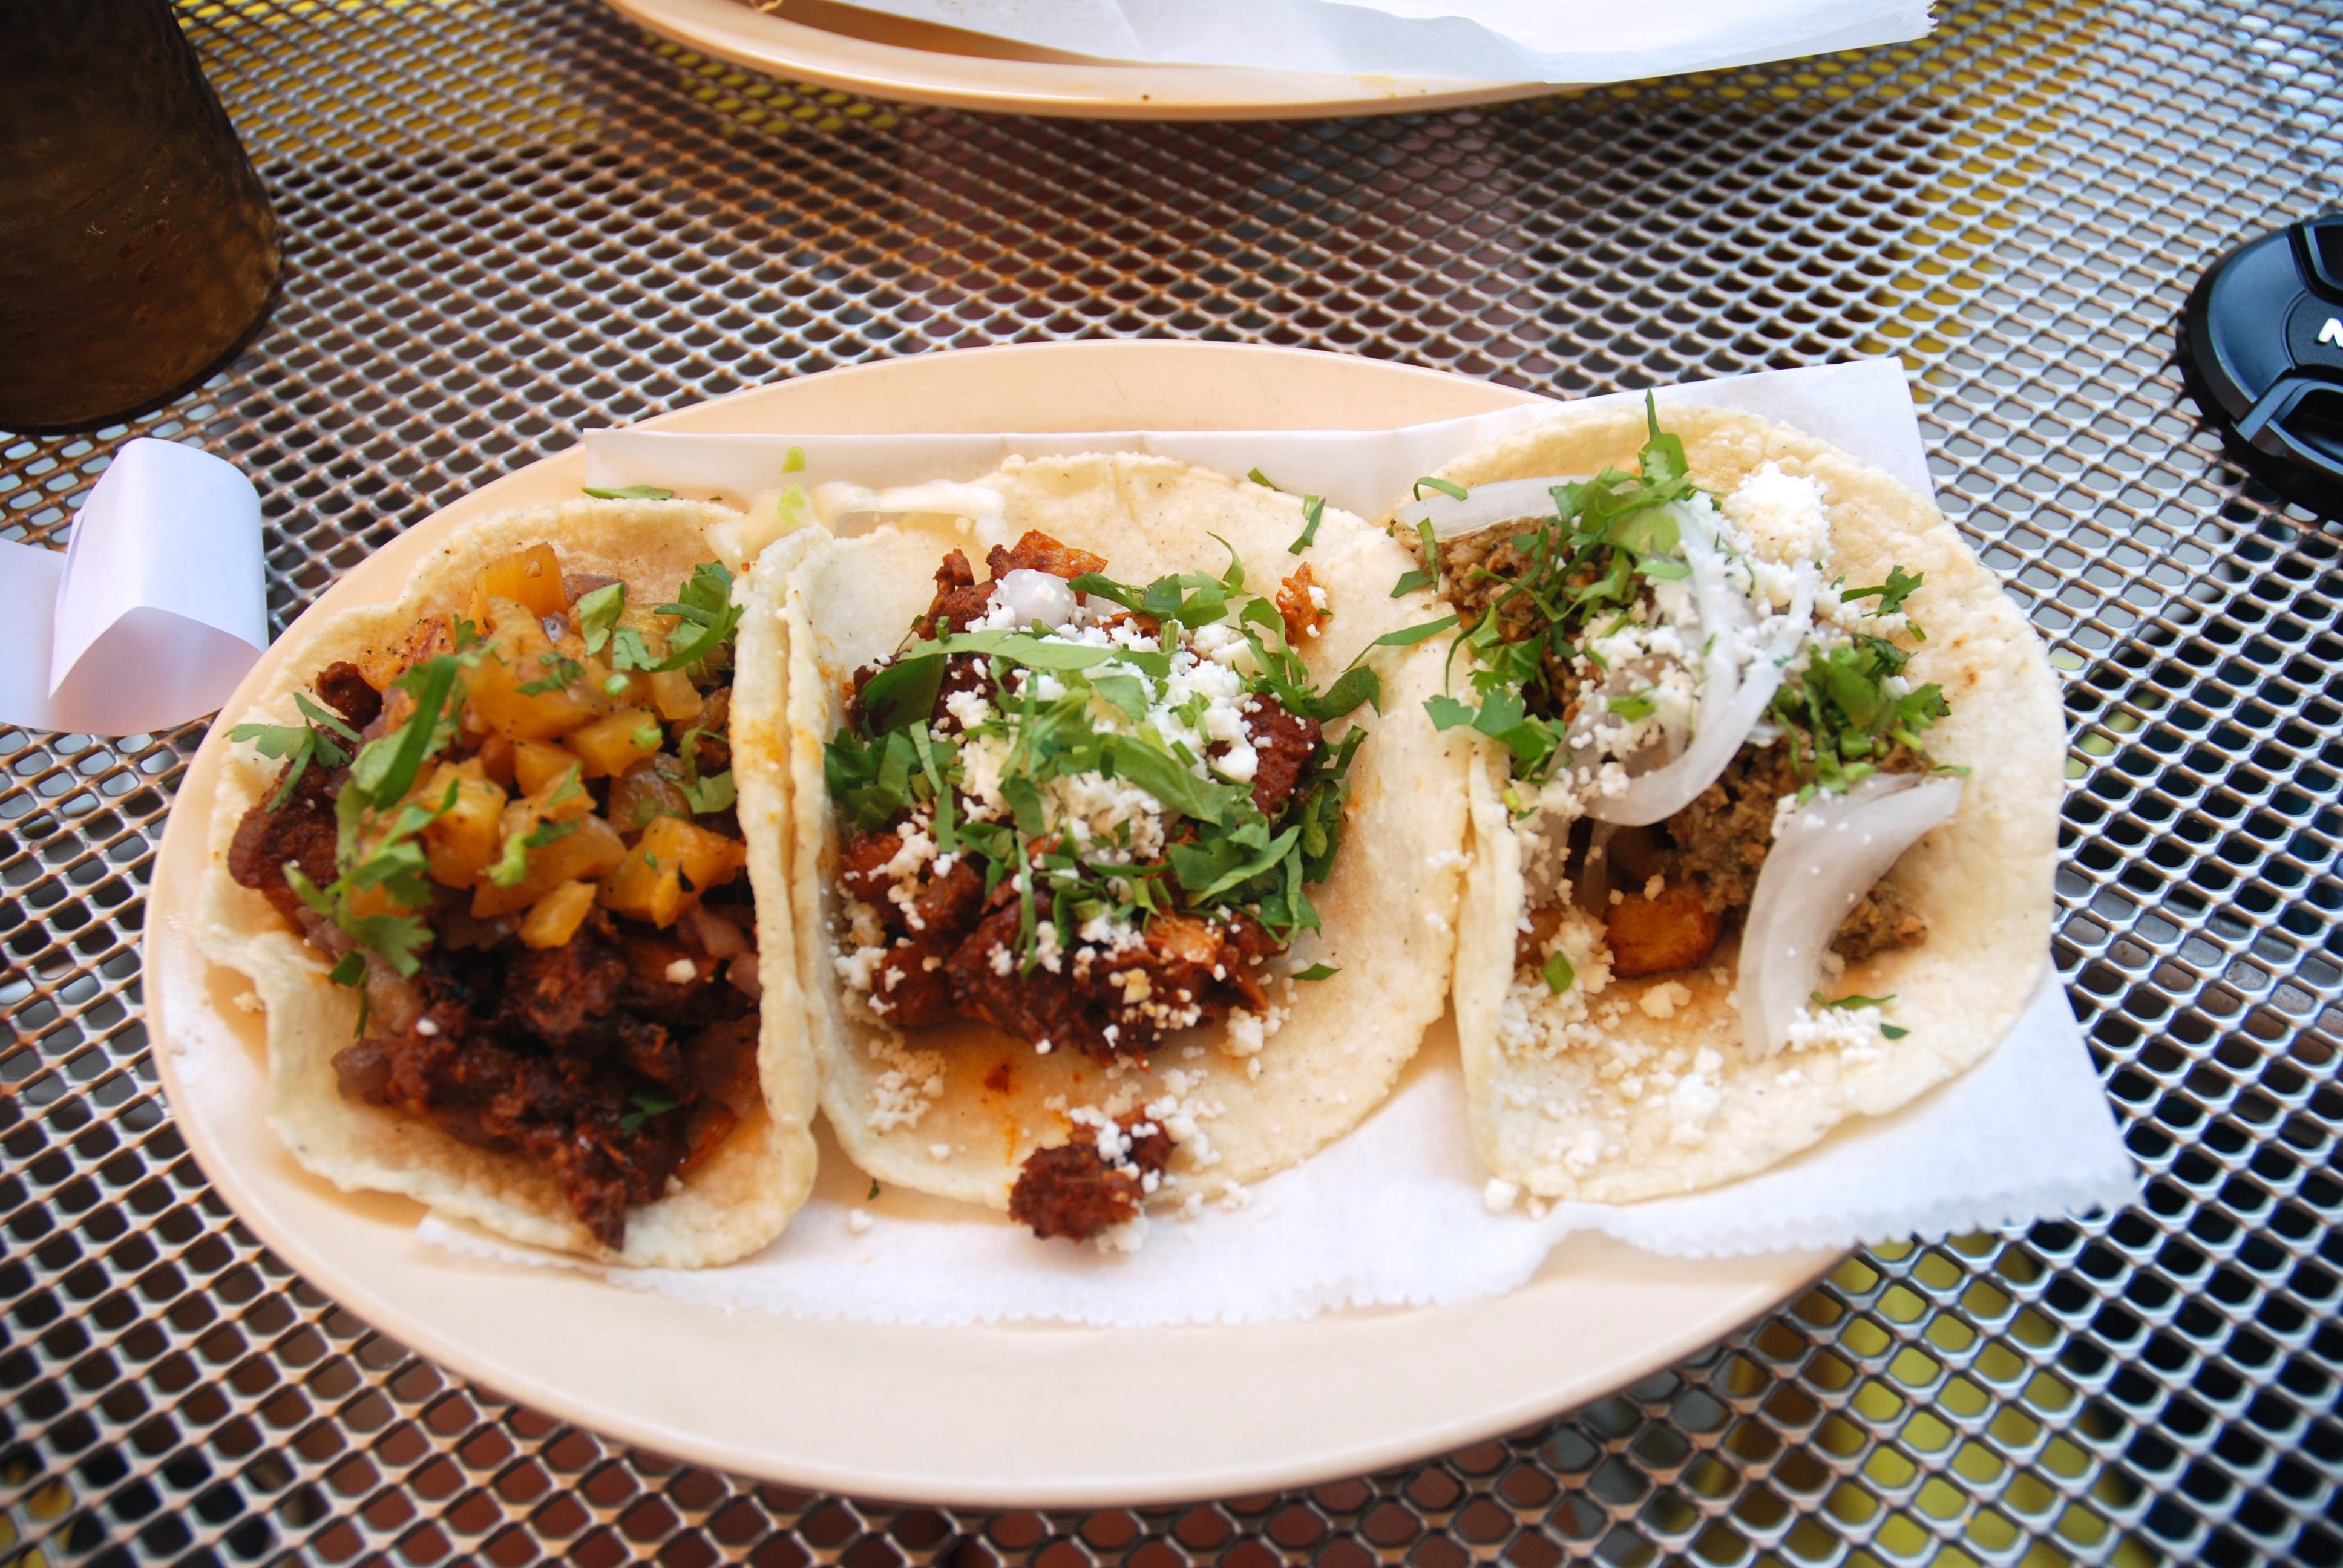 L to R: Taco Al Pastor, Taco De Panza, and Taco De Chorizo Verde - served family style!